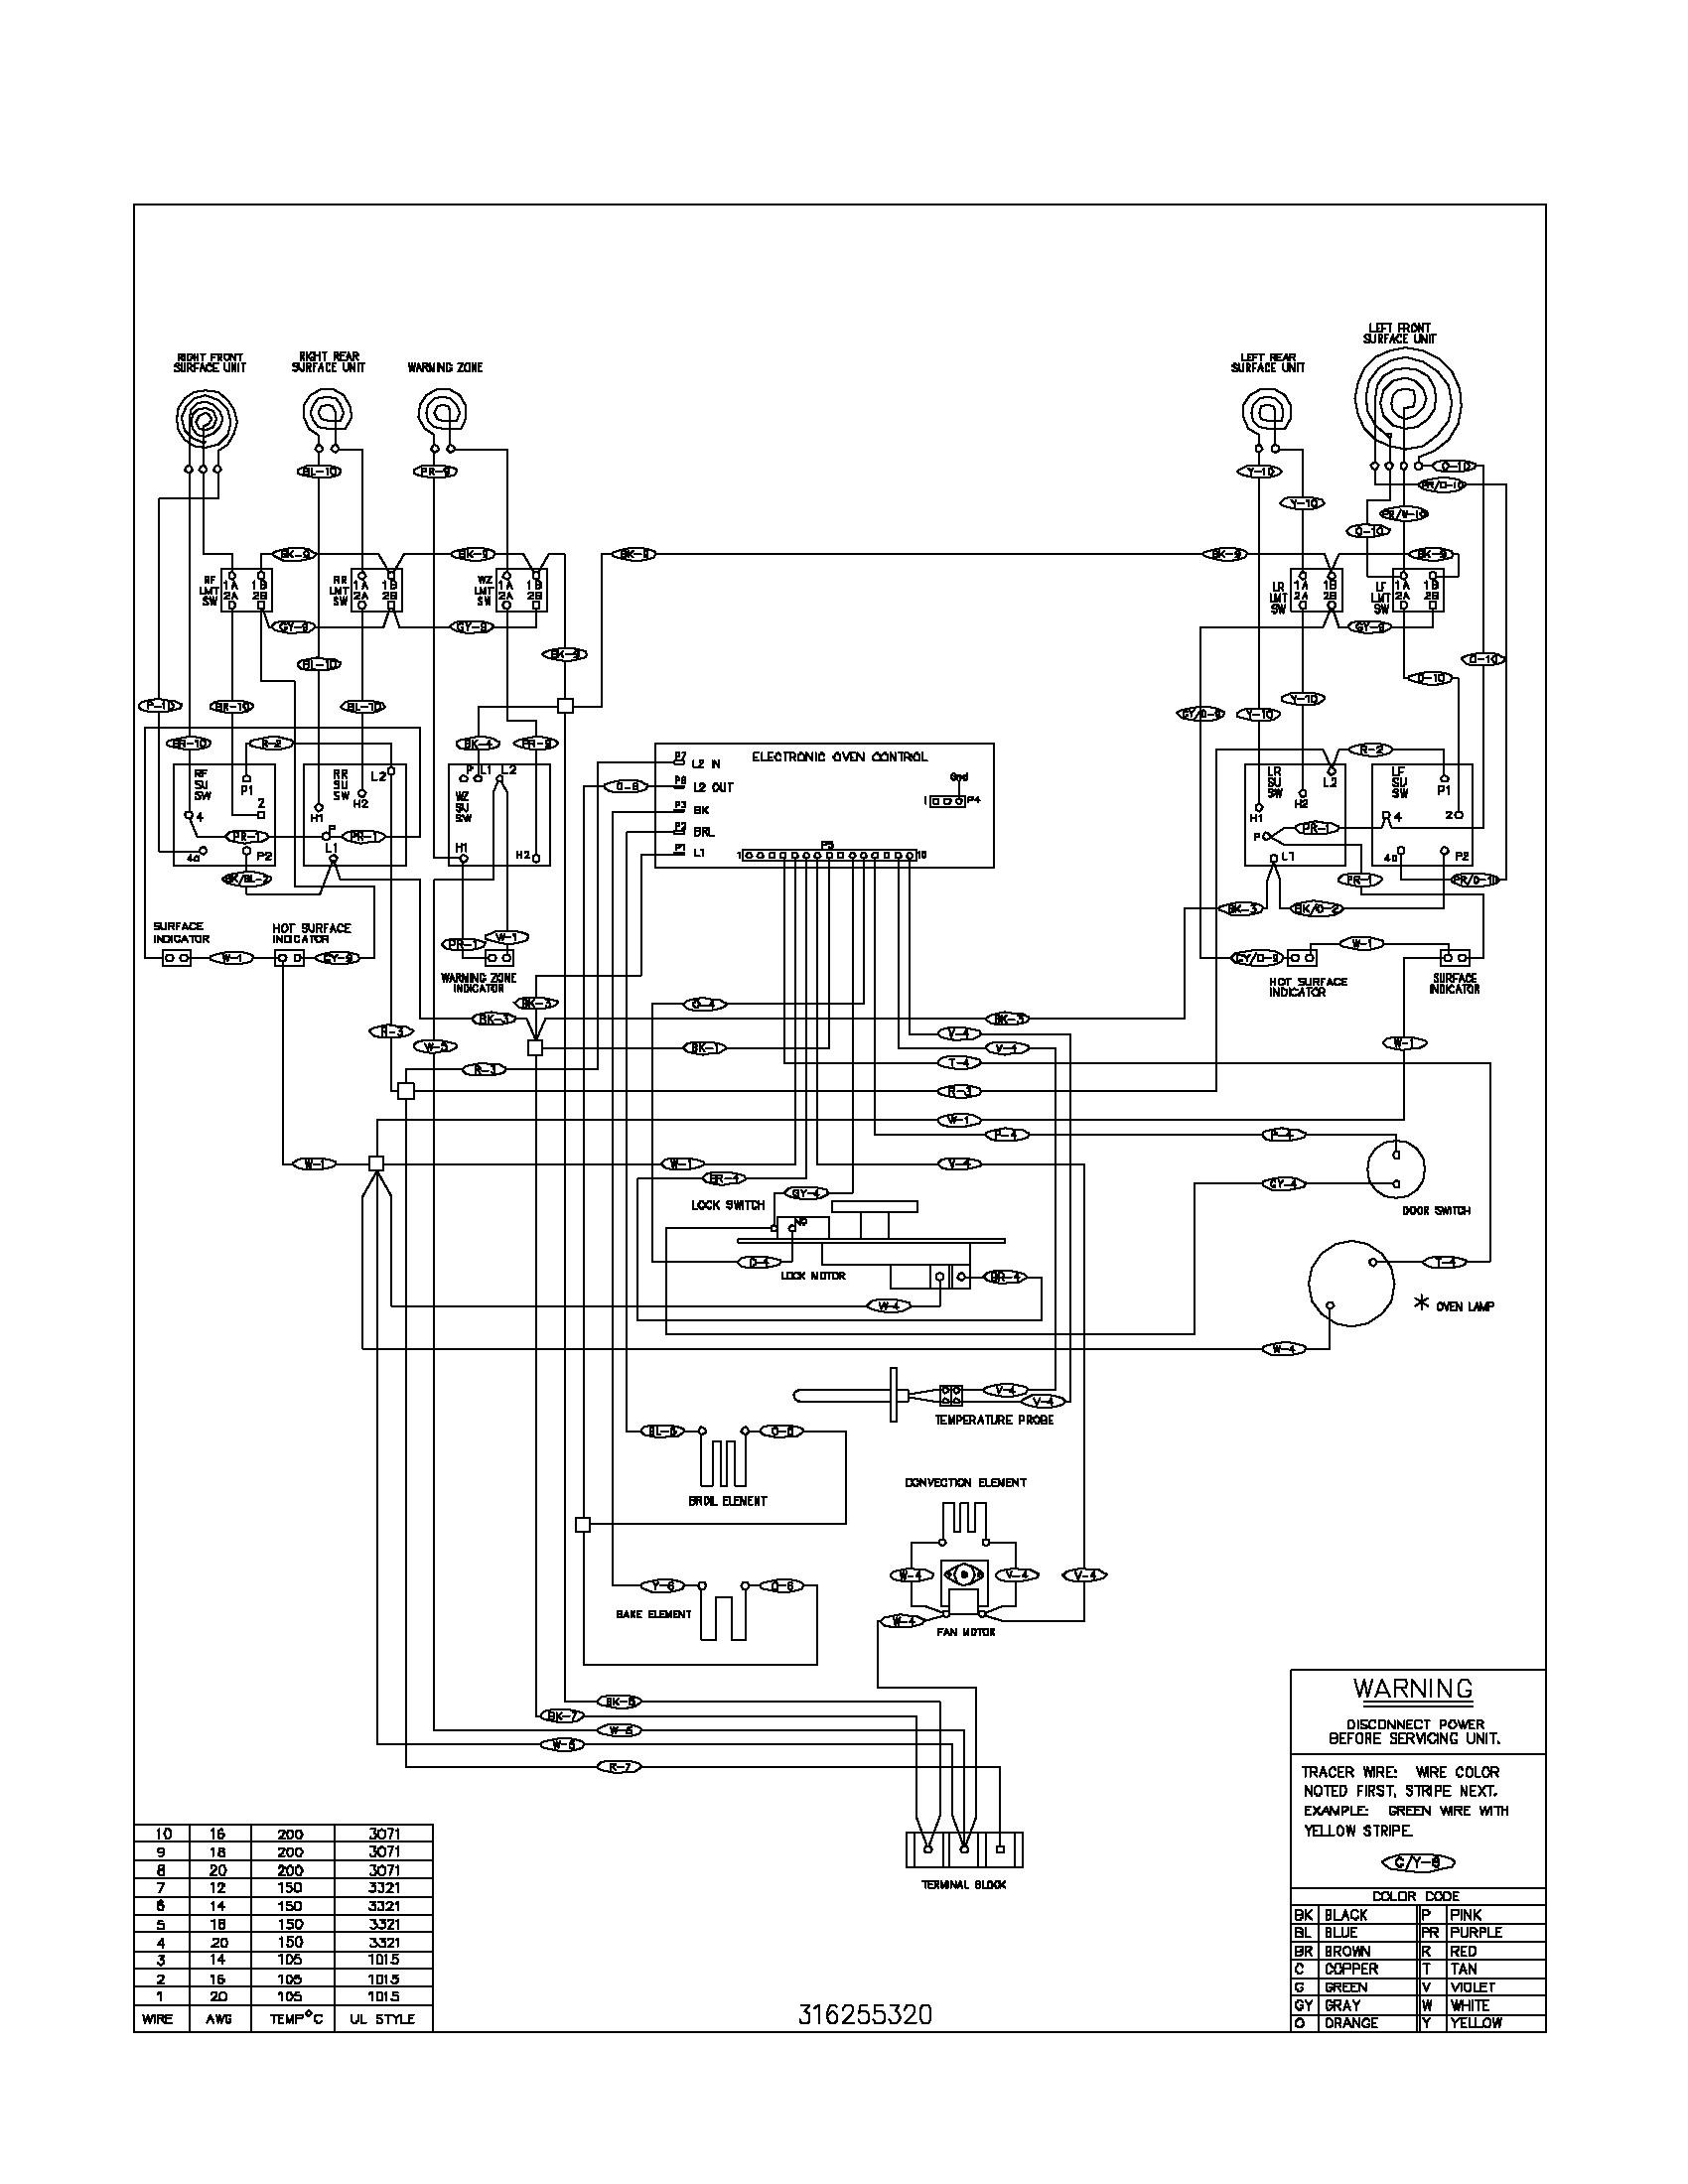 Ge Monogram Refrigerator Parts Diagram Whirlpool 6wri24wk Electrical Circuitiagram In Refrigerator Of Ge Monogram Refrigerator Parts Diagram